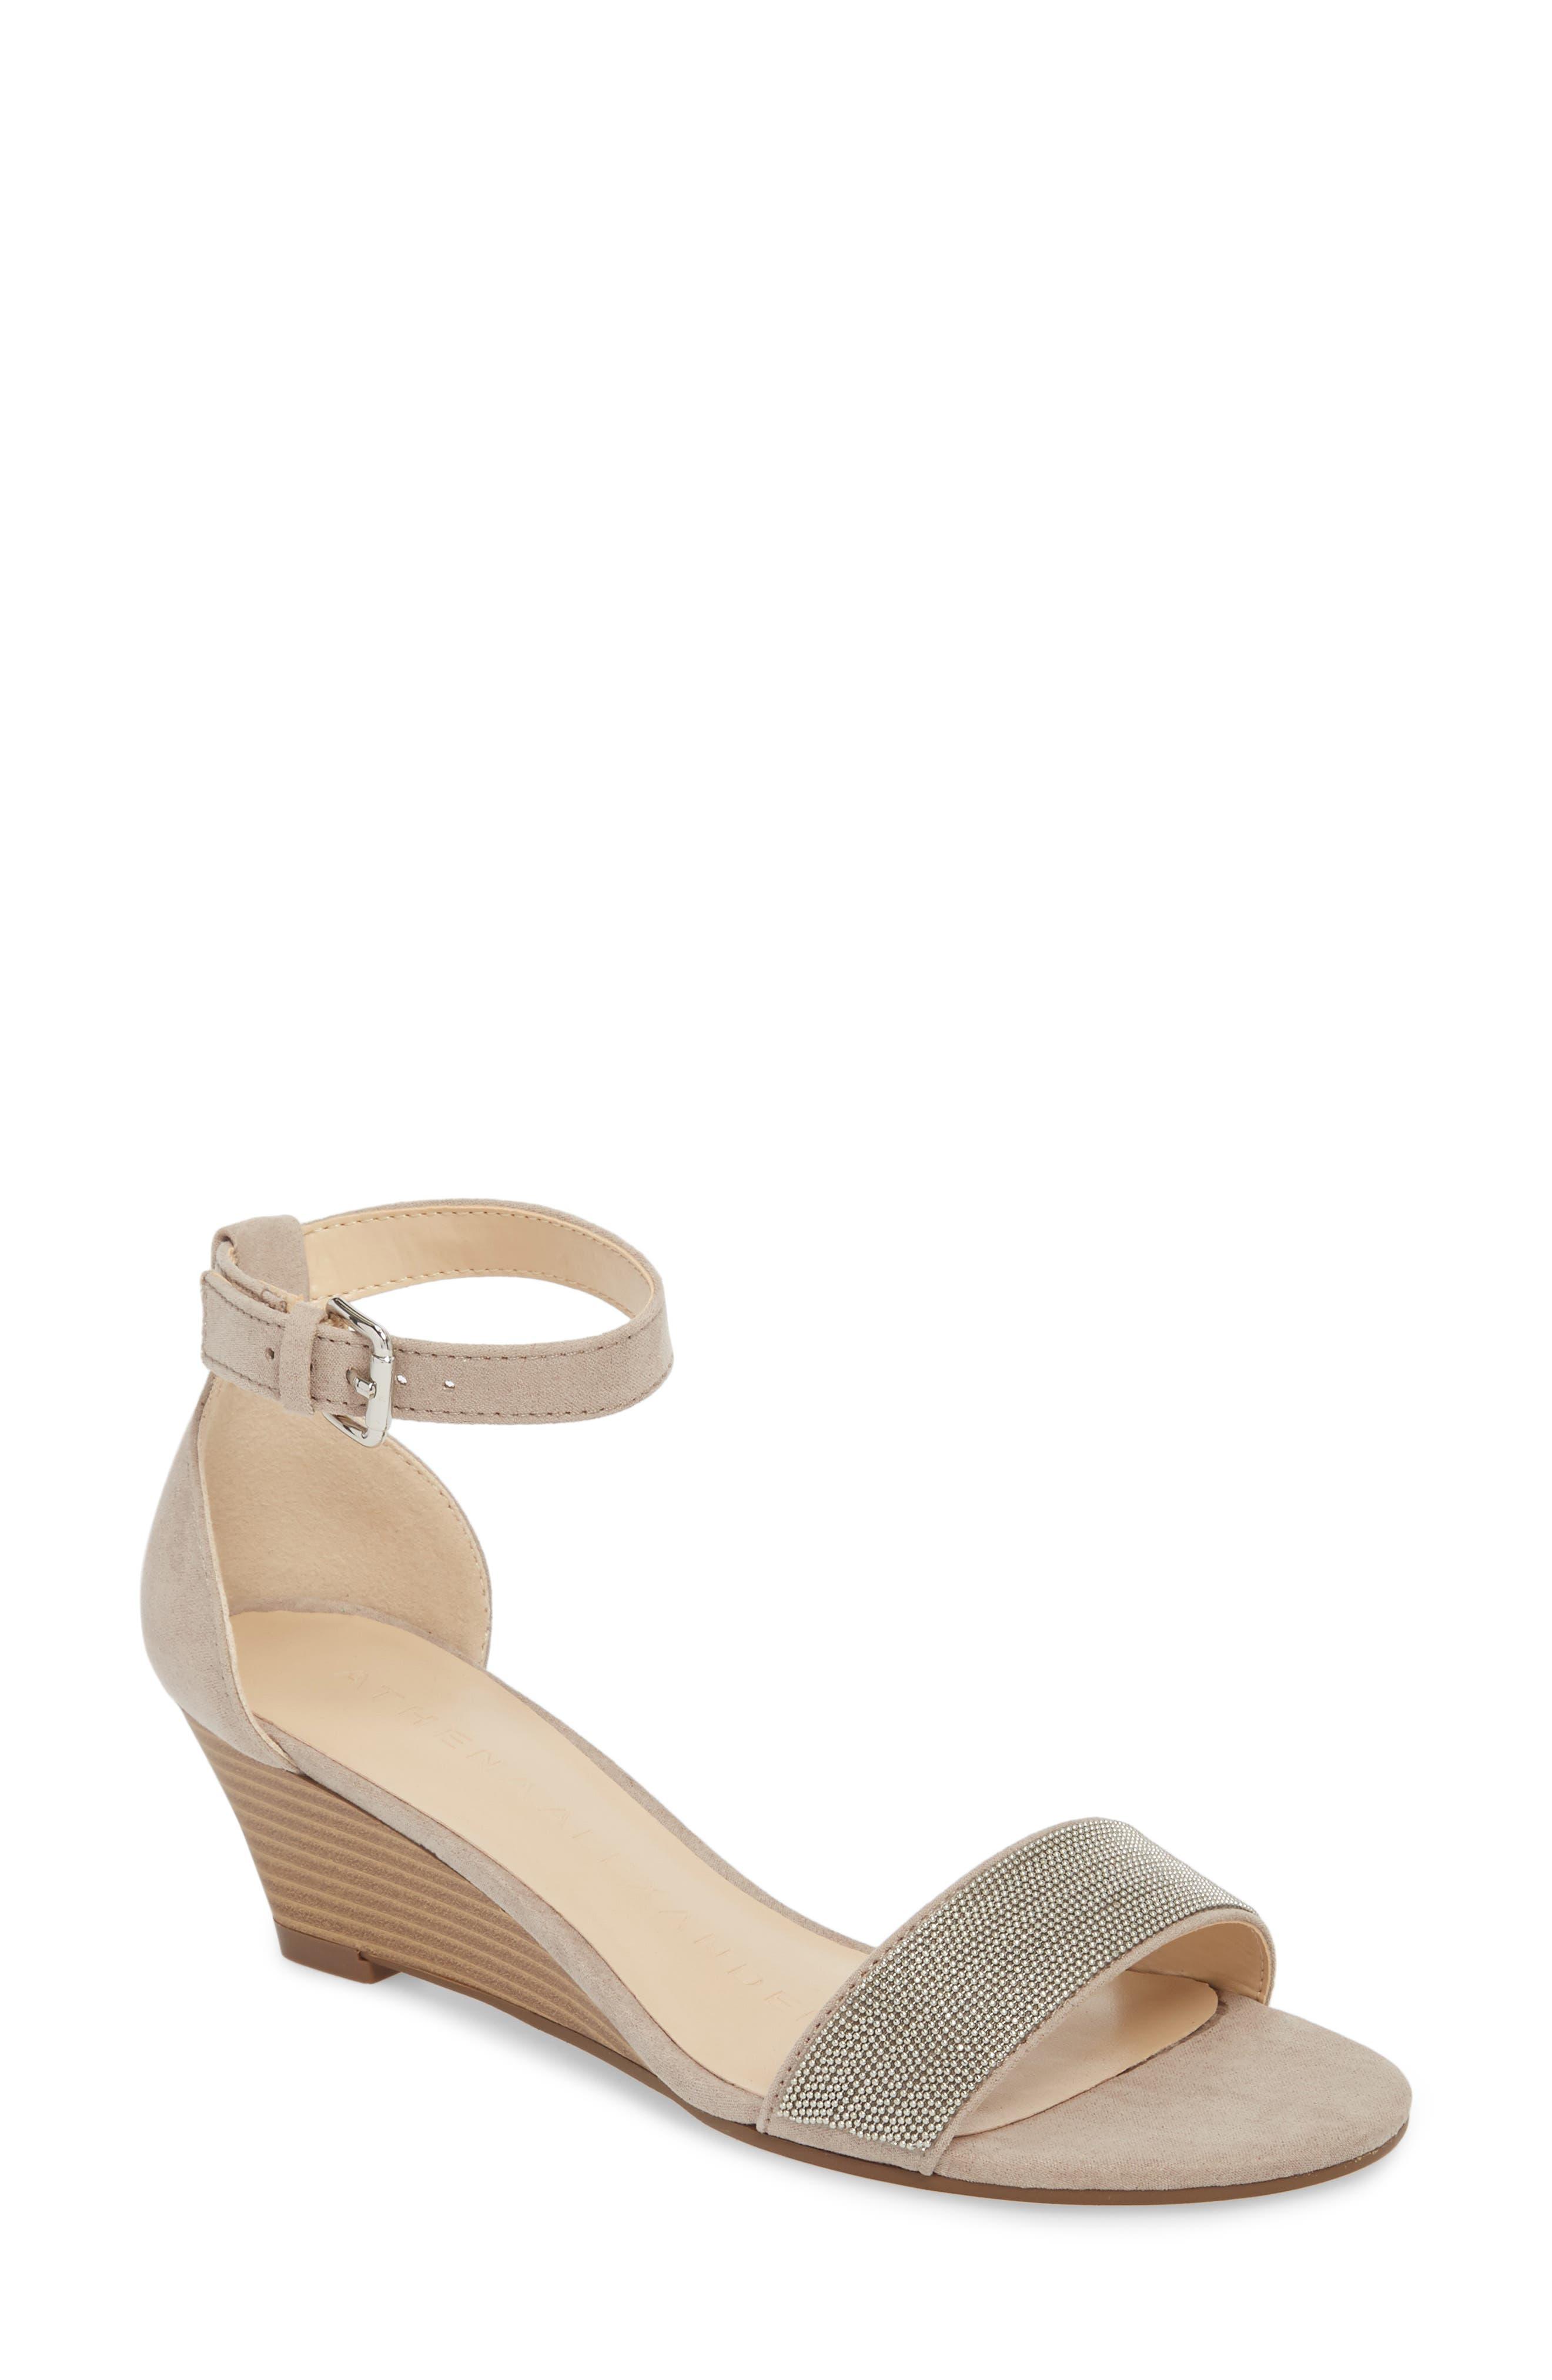 Athena Alexander Enfield Ankle Strap Wedge Sandal- Grey